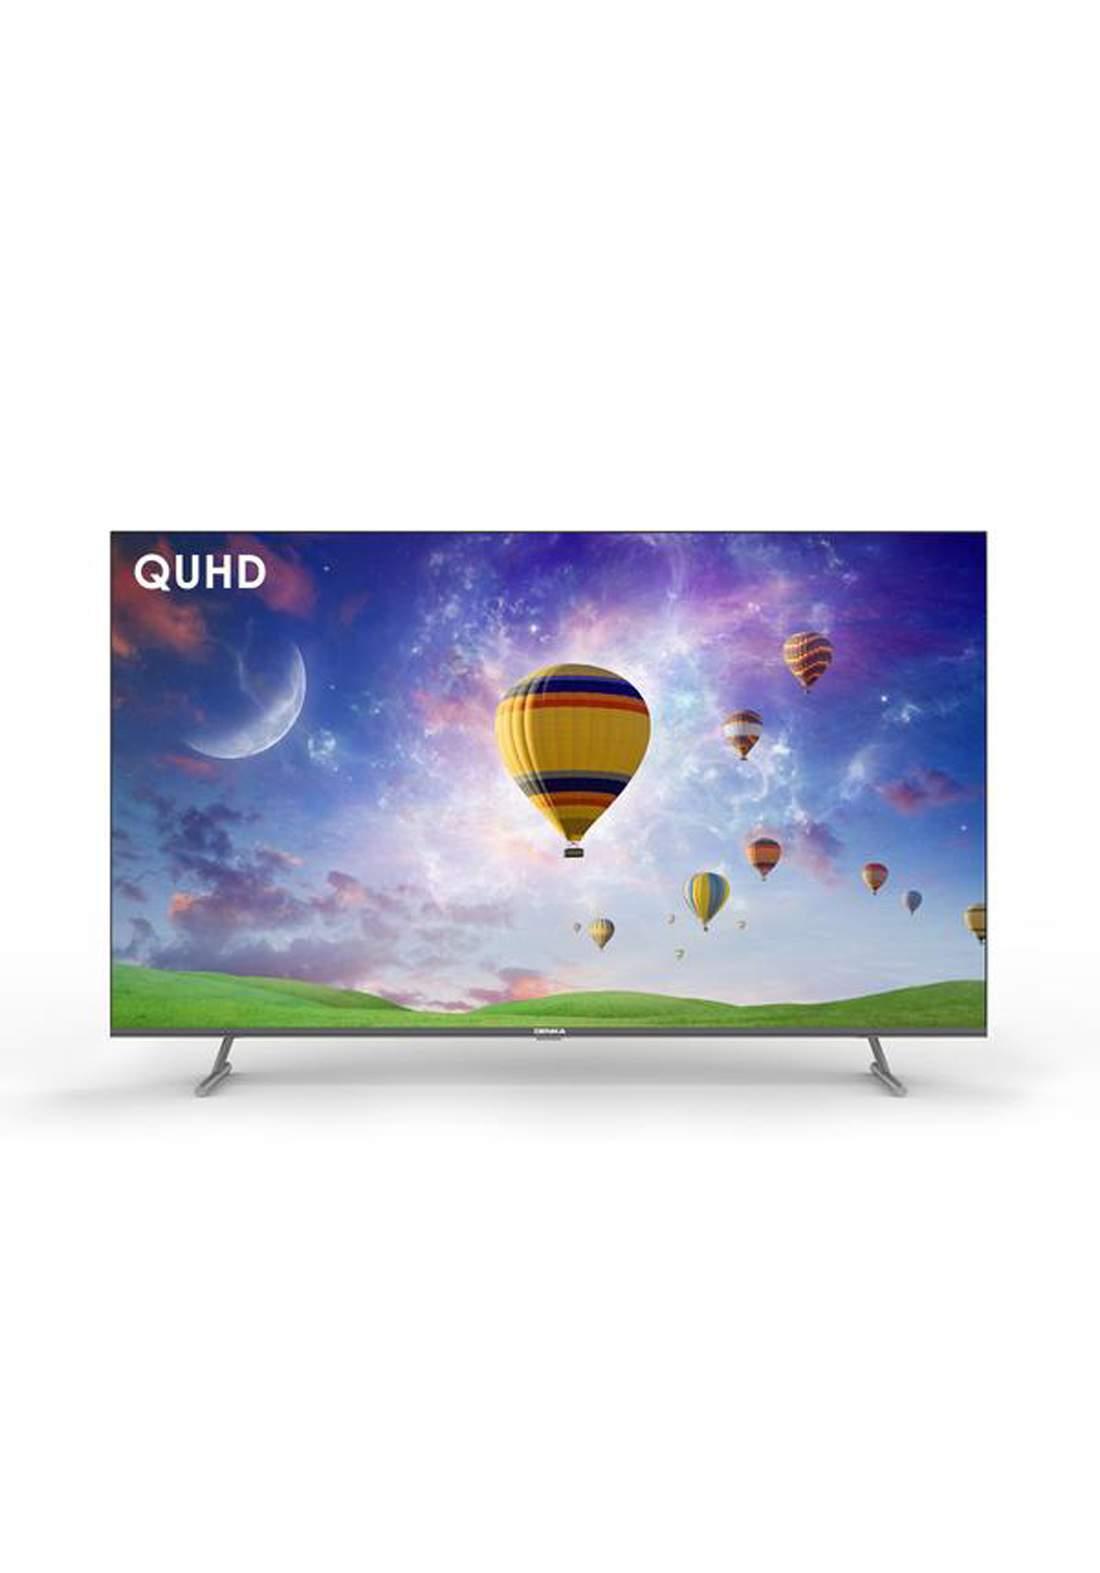 Denka UMS-65USMLED  Smart TV-65  شاشة من دنكا